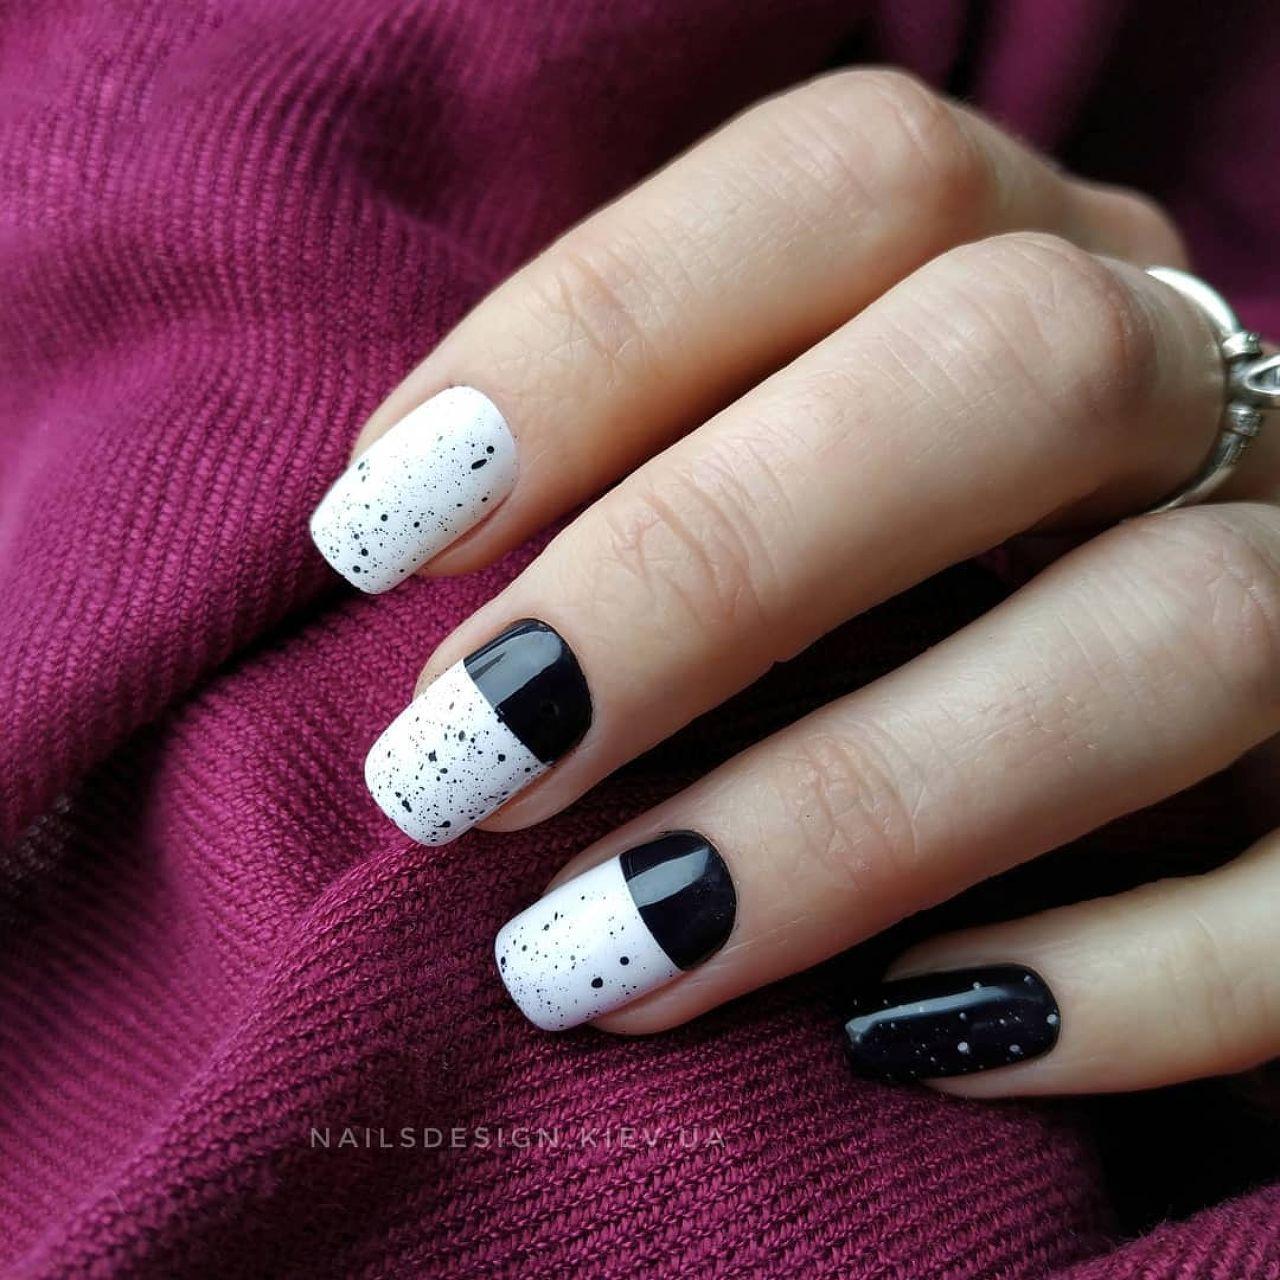 Photo 3 of Nails Design Kiev